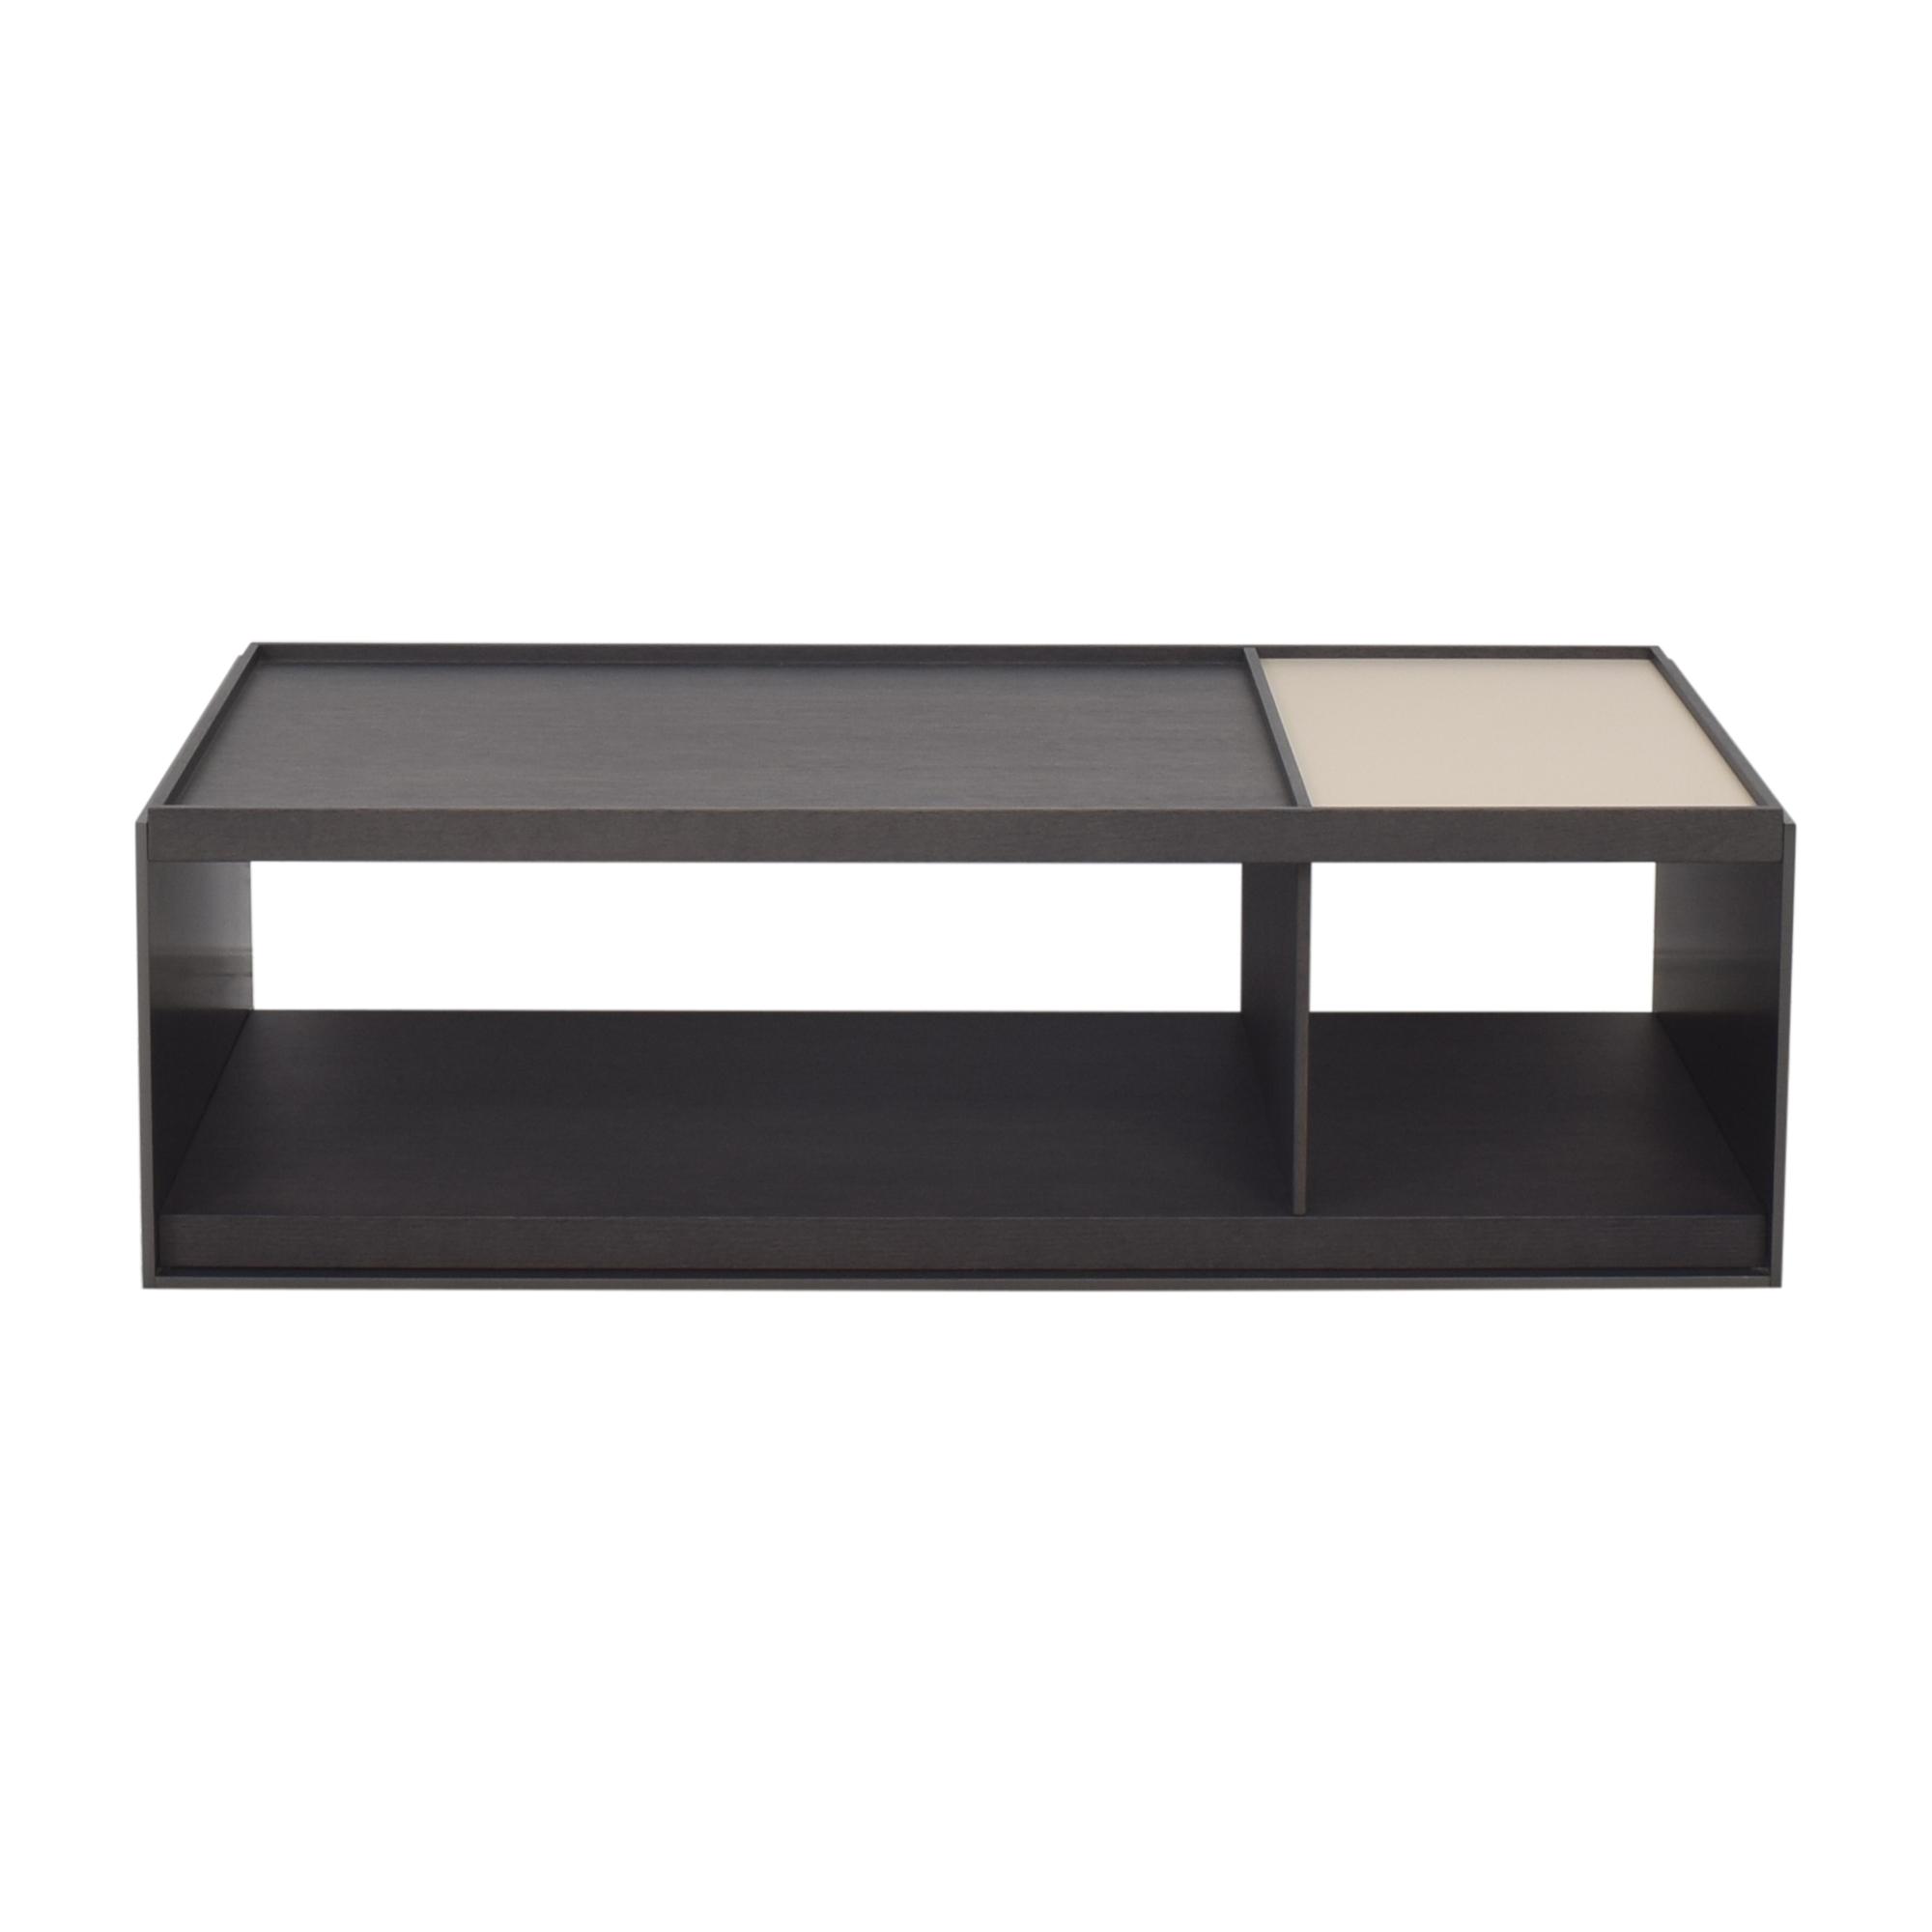 B&B Italia Surface Small Table / Coffee Tables